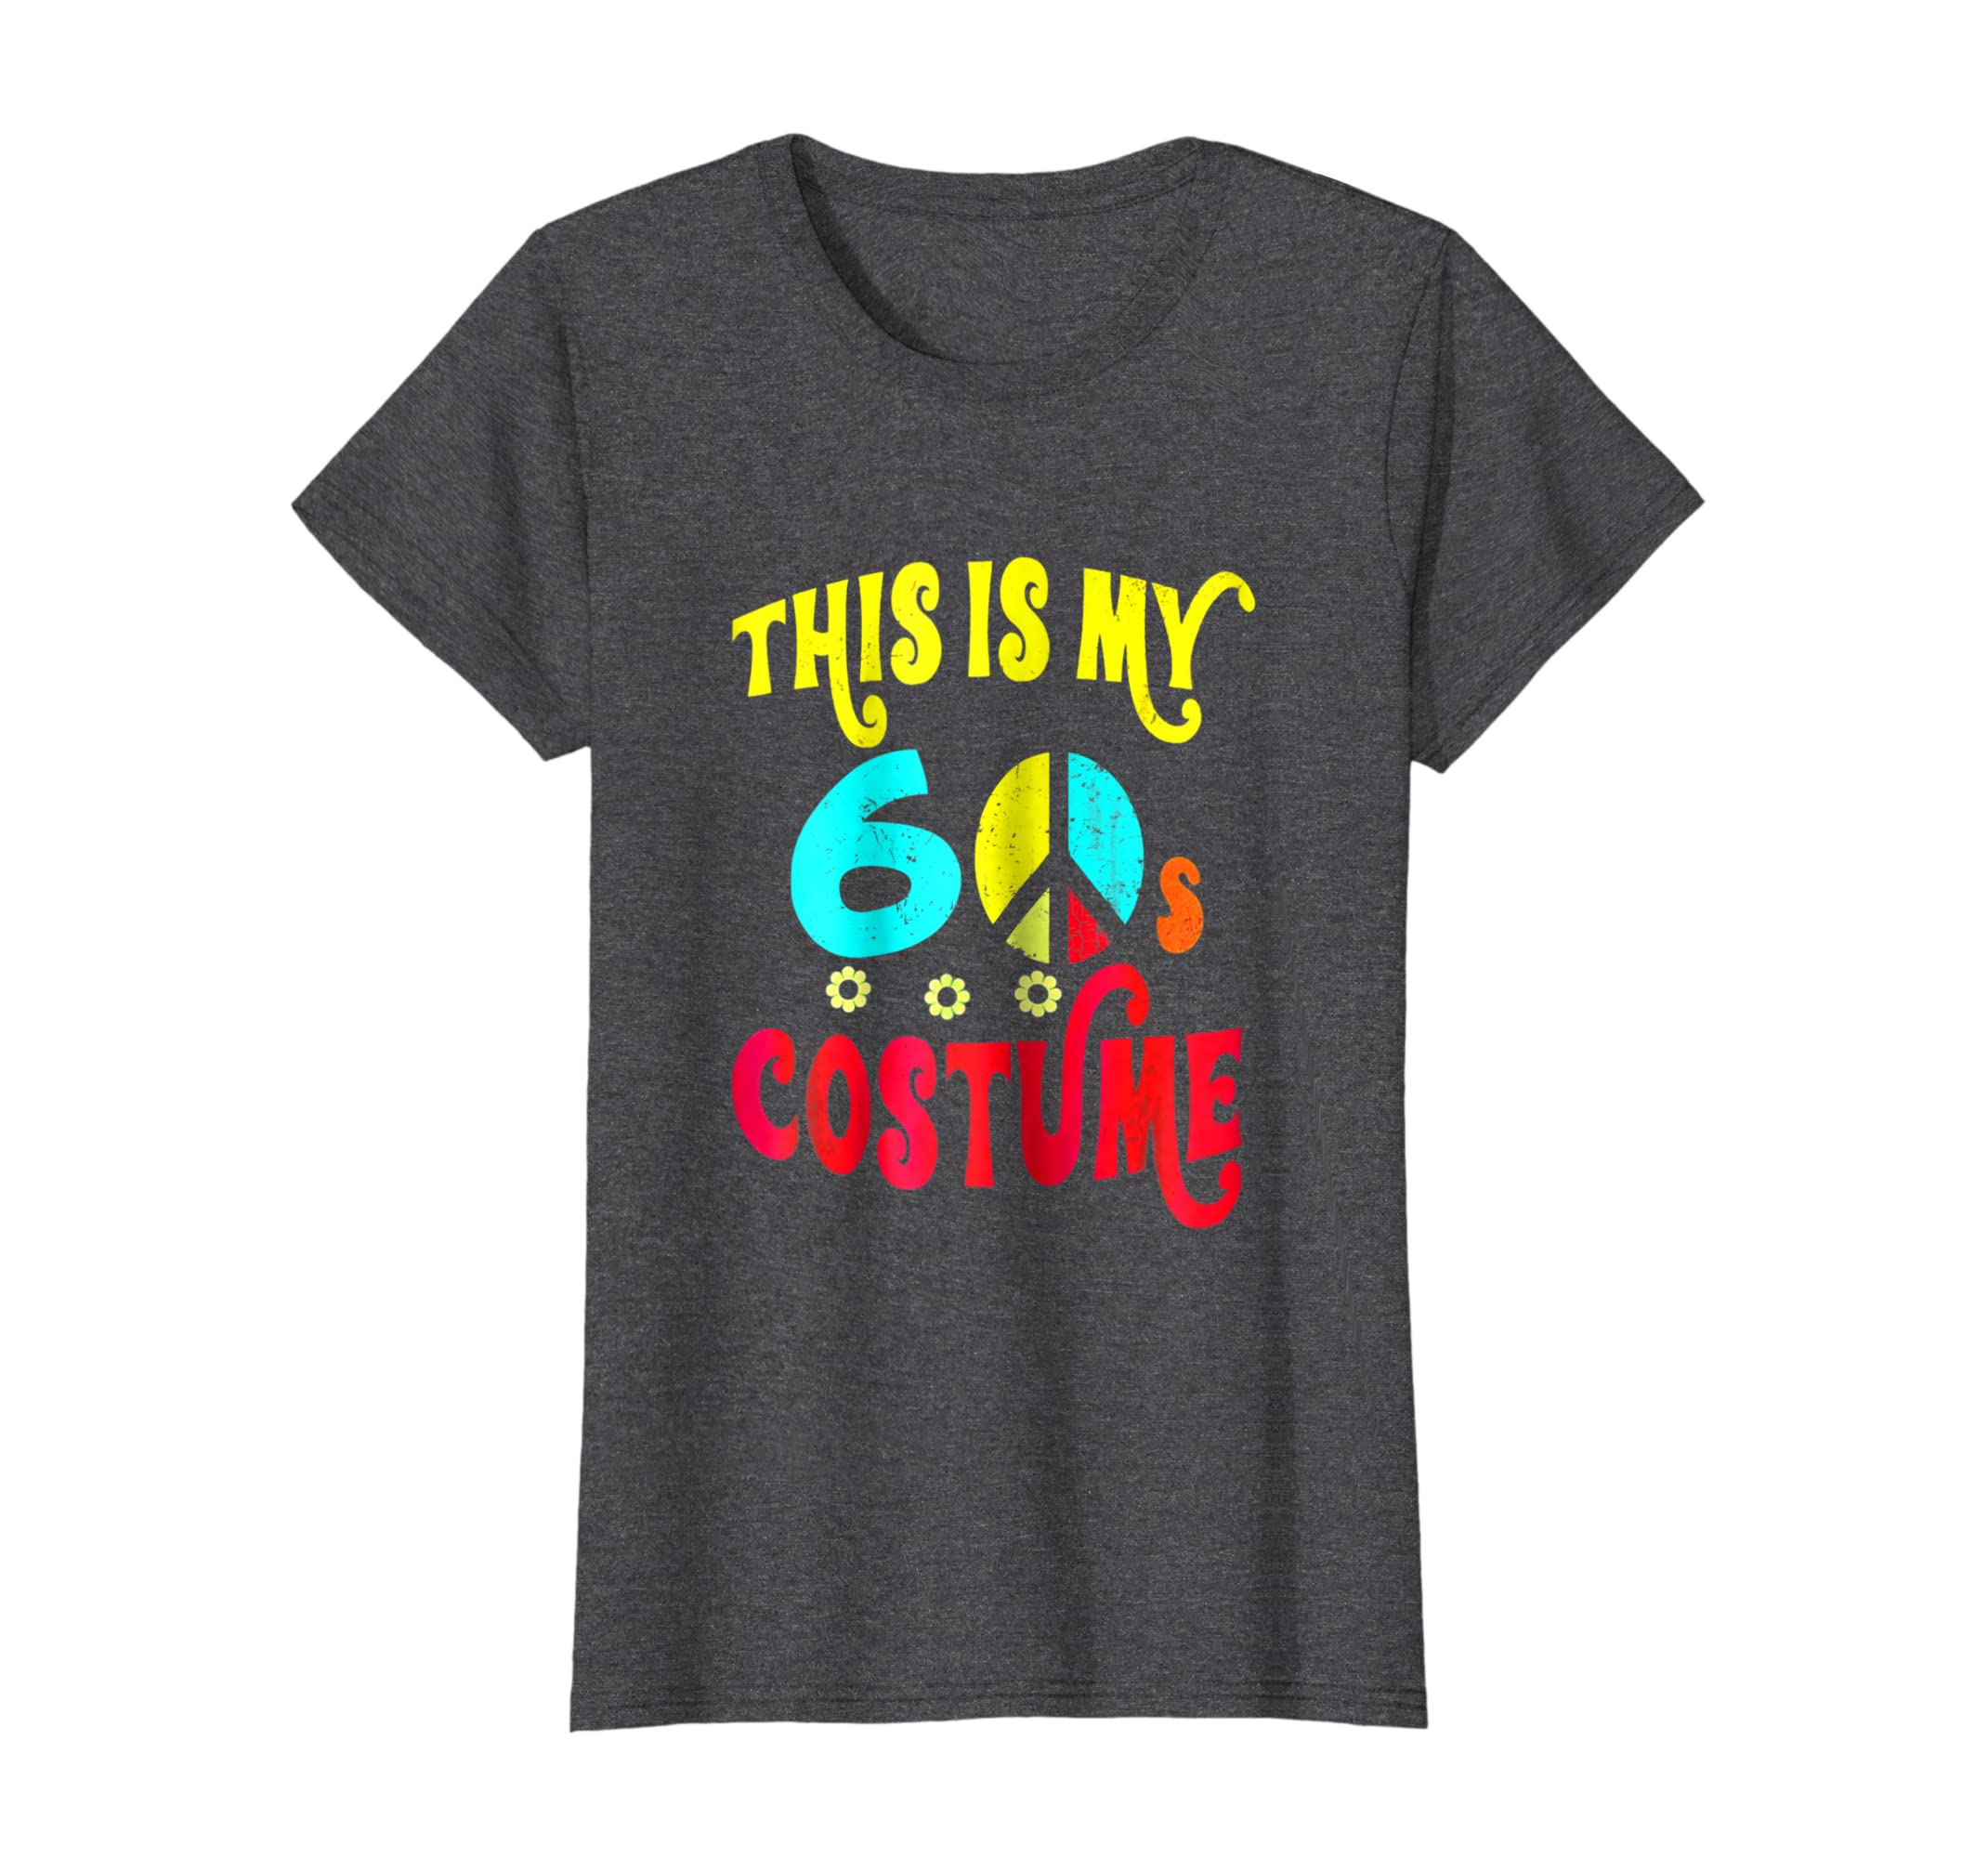 This is My 60s Costume Shirt Neon Groovy Peace Halloween Tee-Awarplus